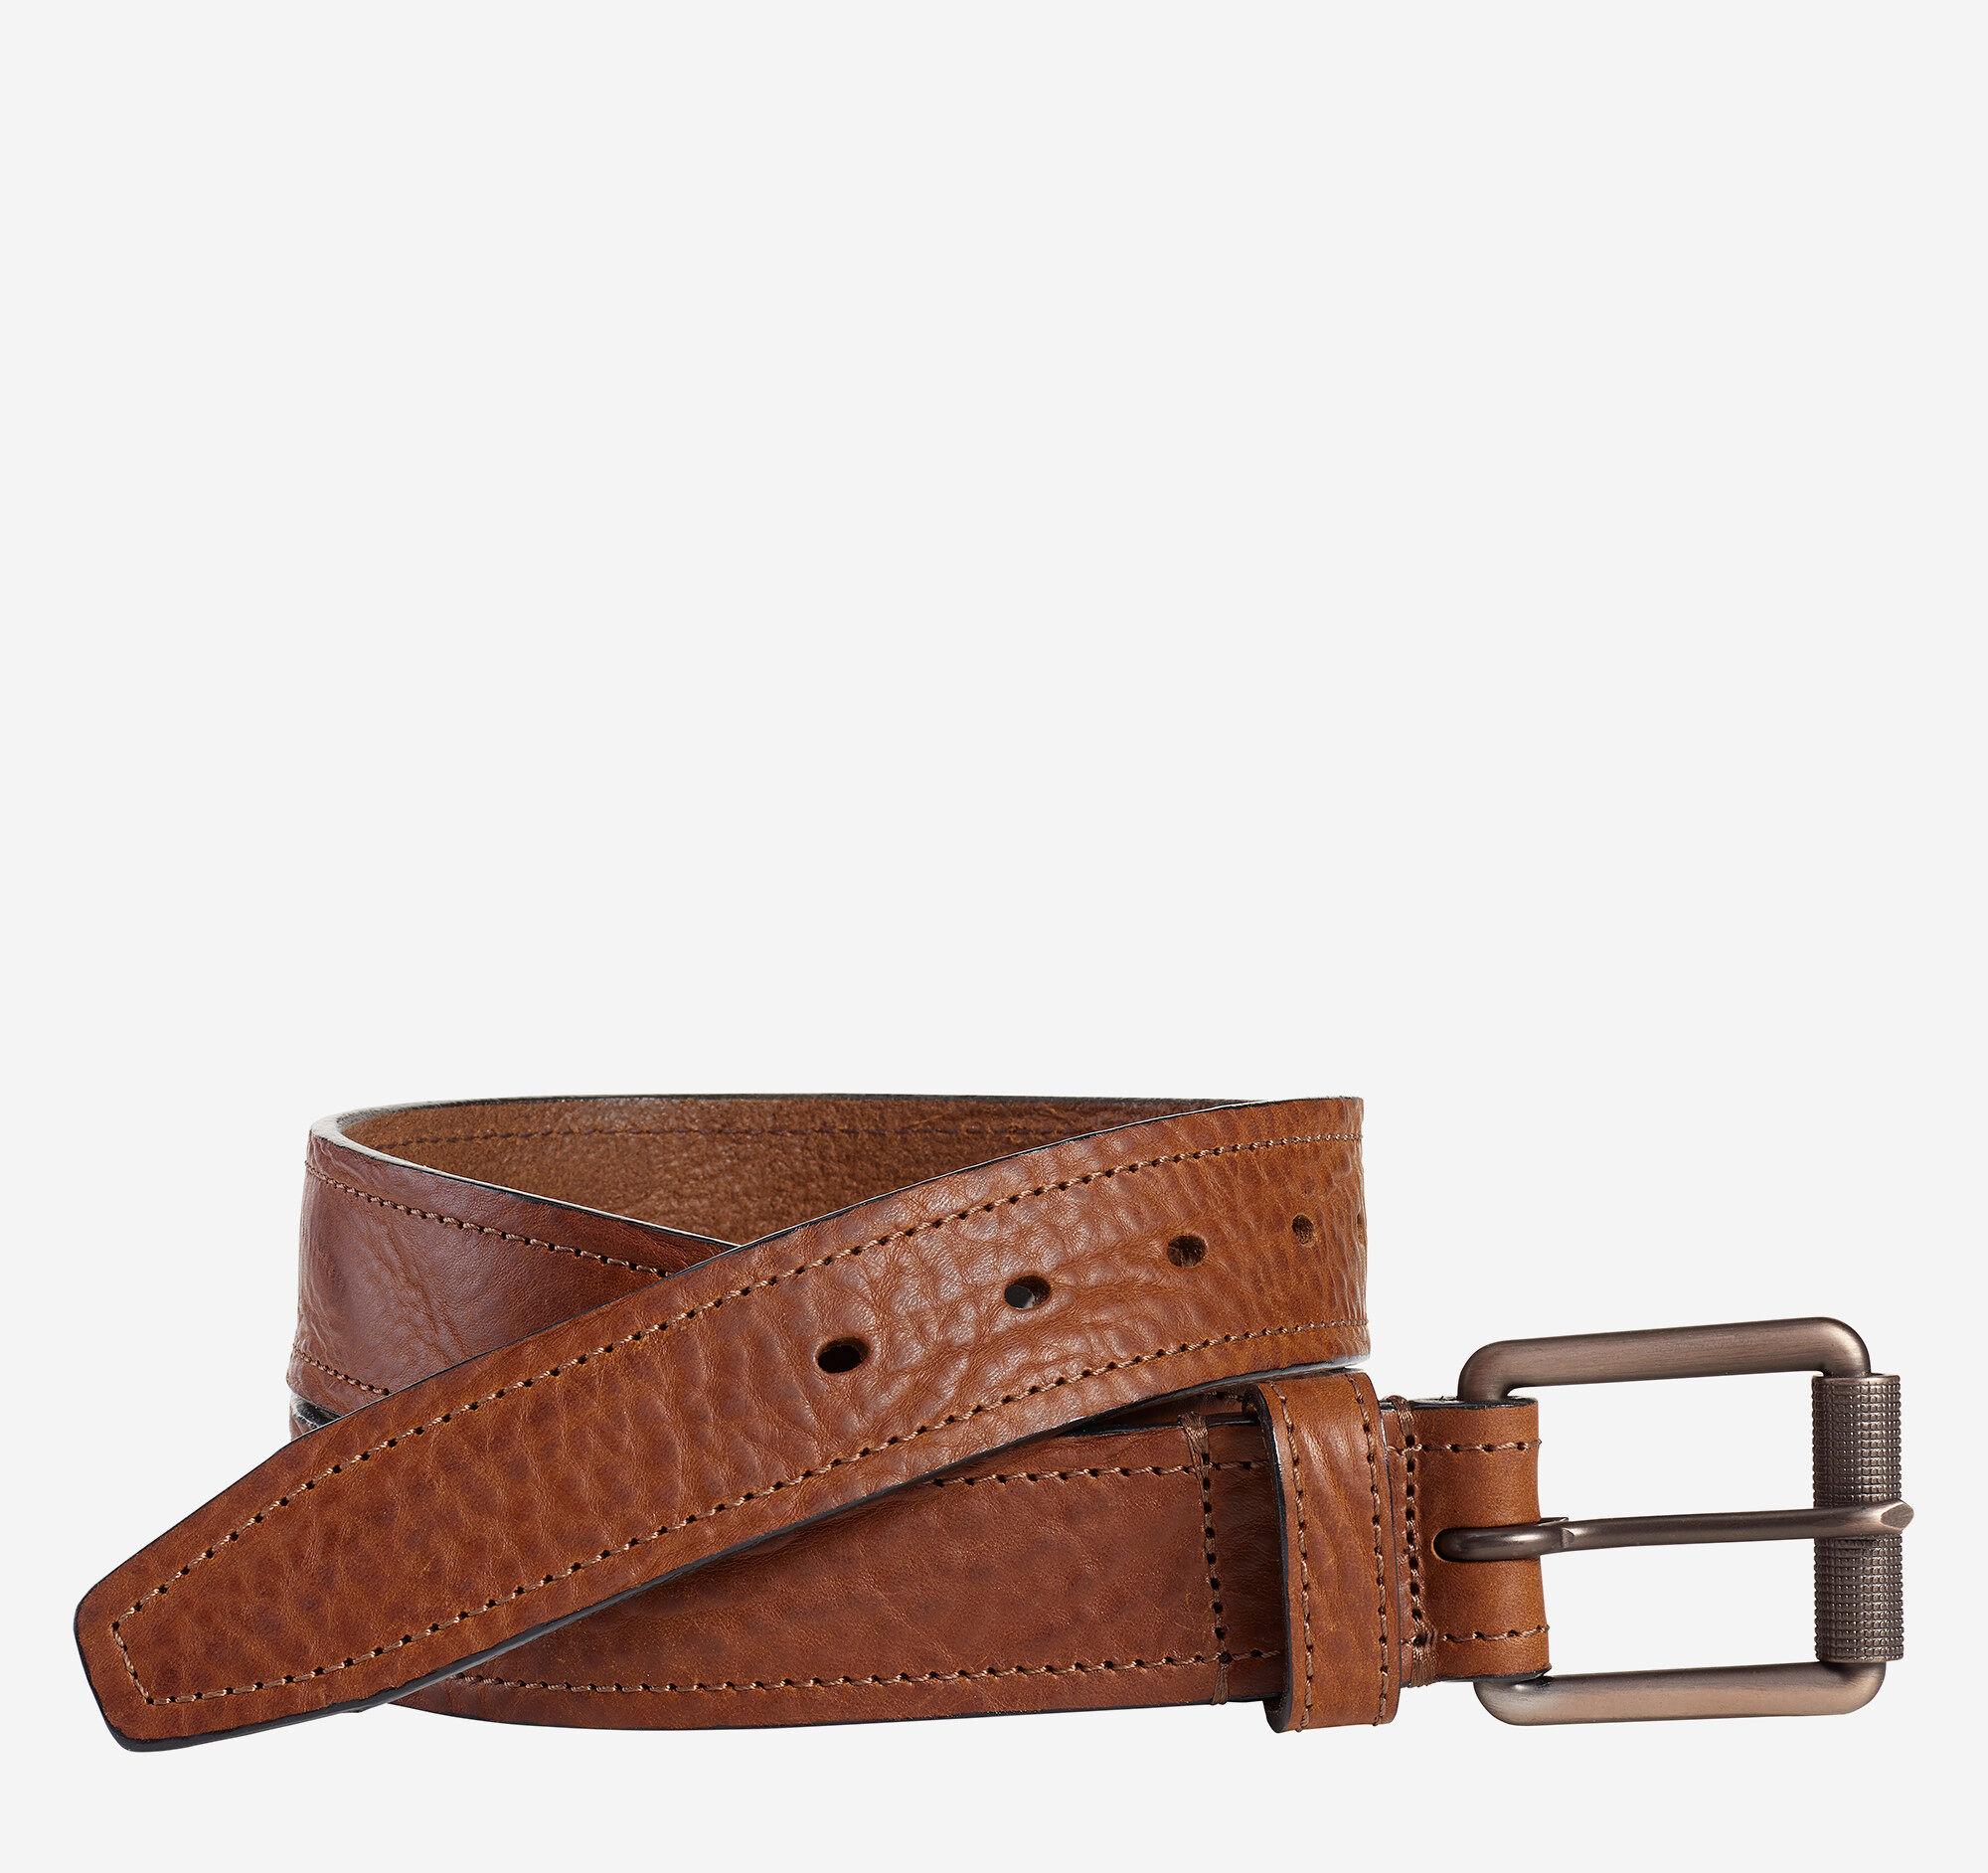 Johnston & Murphy Men's Washed Leather Belt - Tan - Size 42